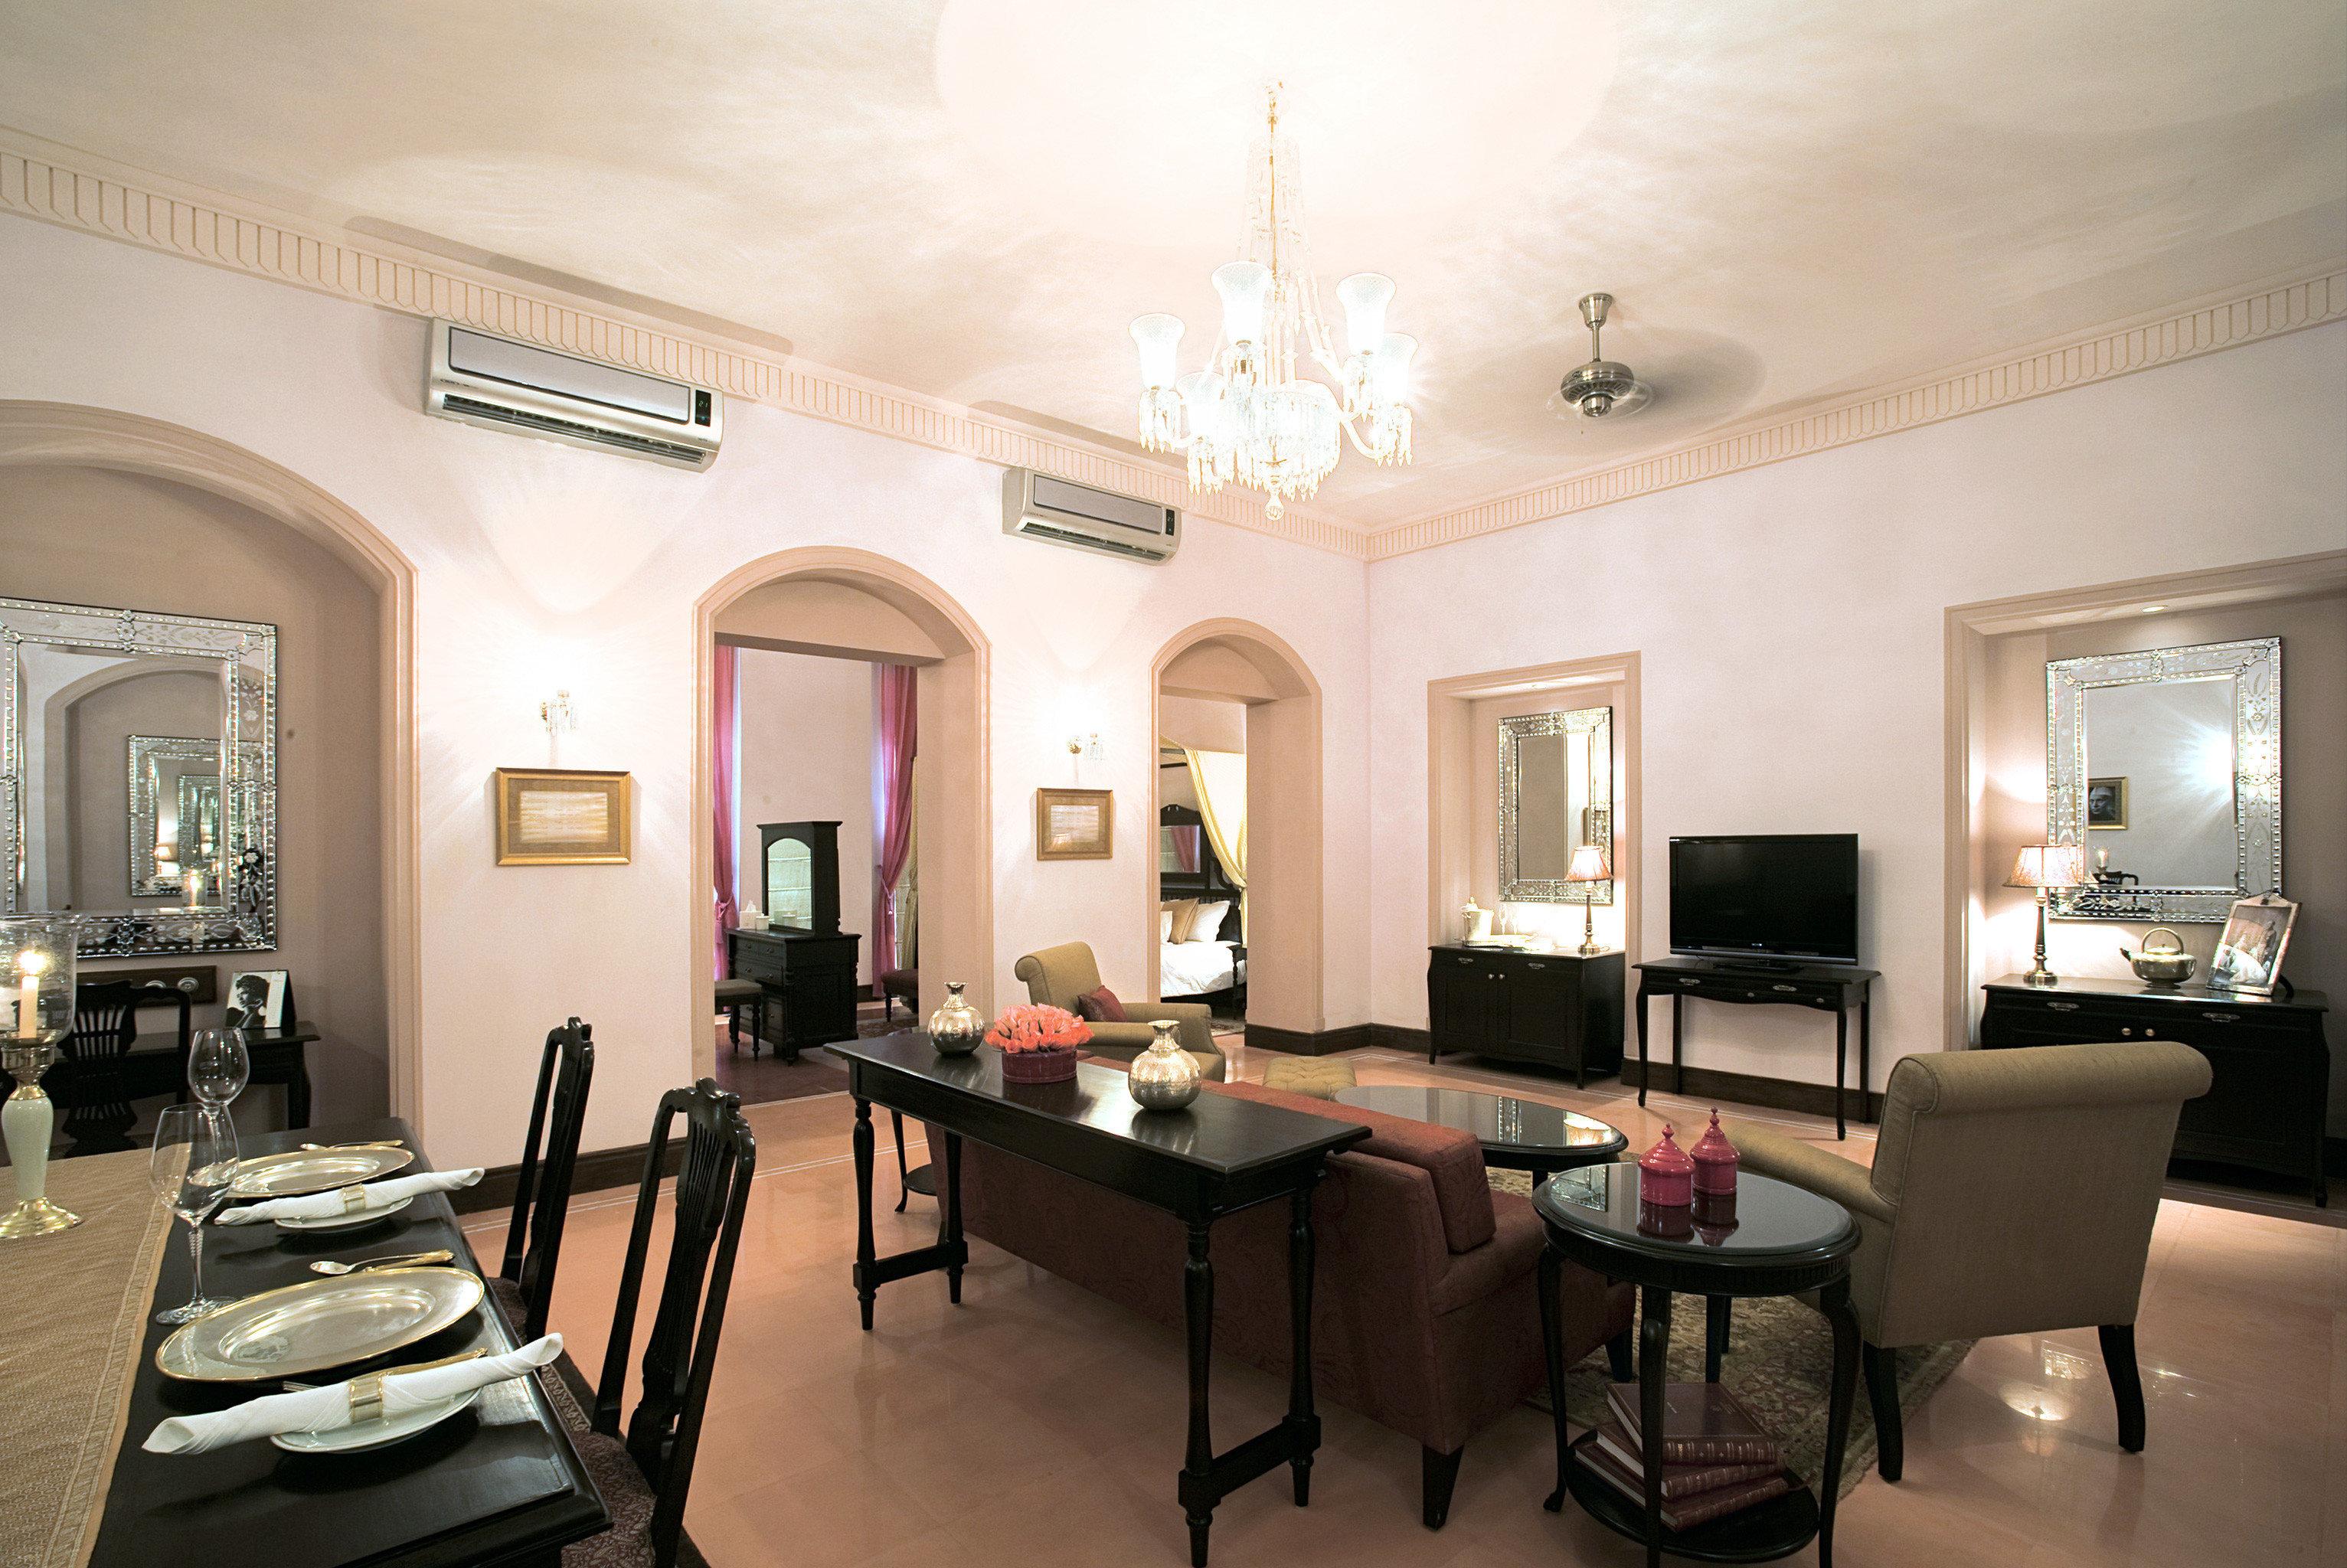 Dining Drink Eat Elegant Luxury Resort property chair living room home Suite Villa condominium mansion leather